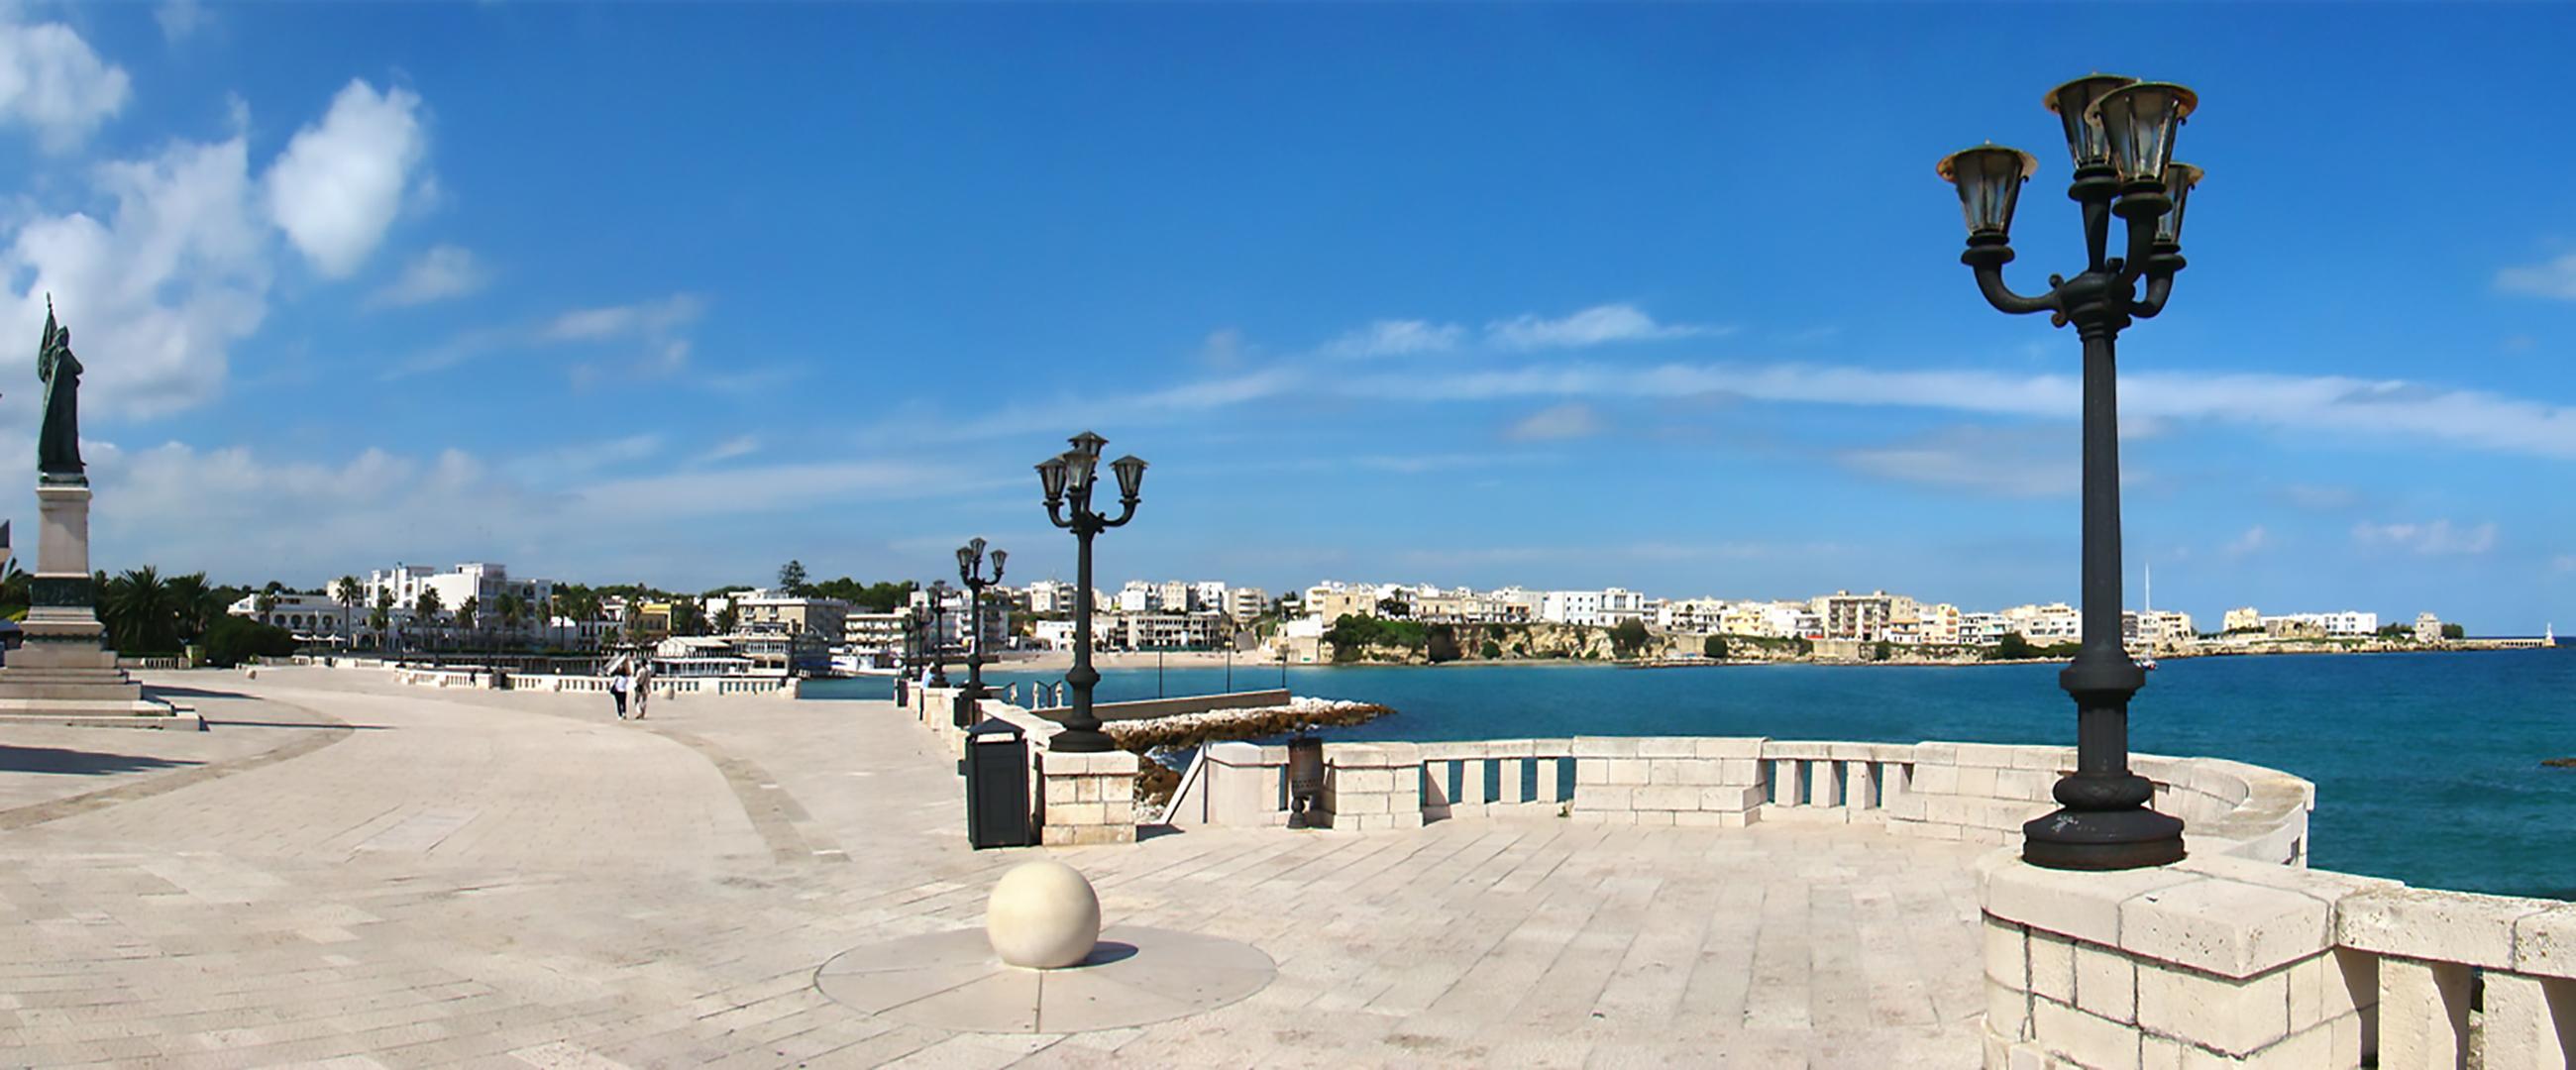 Puglia_Otranto1_tango7174